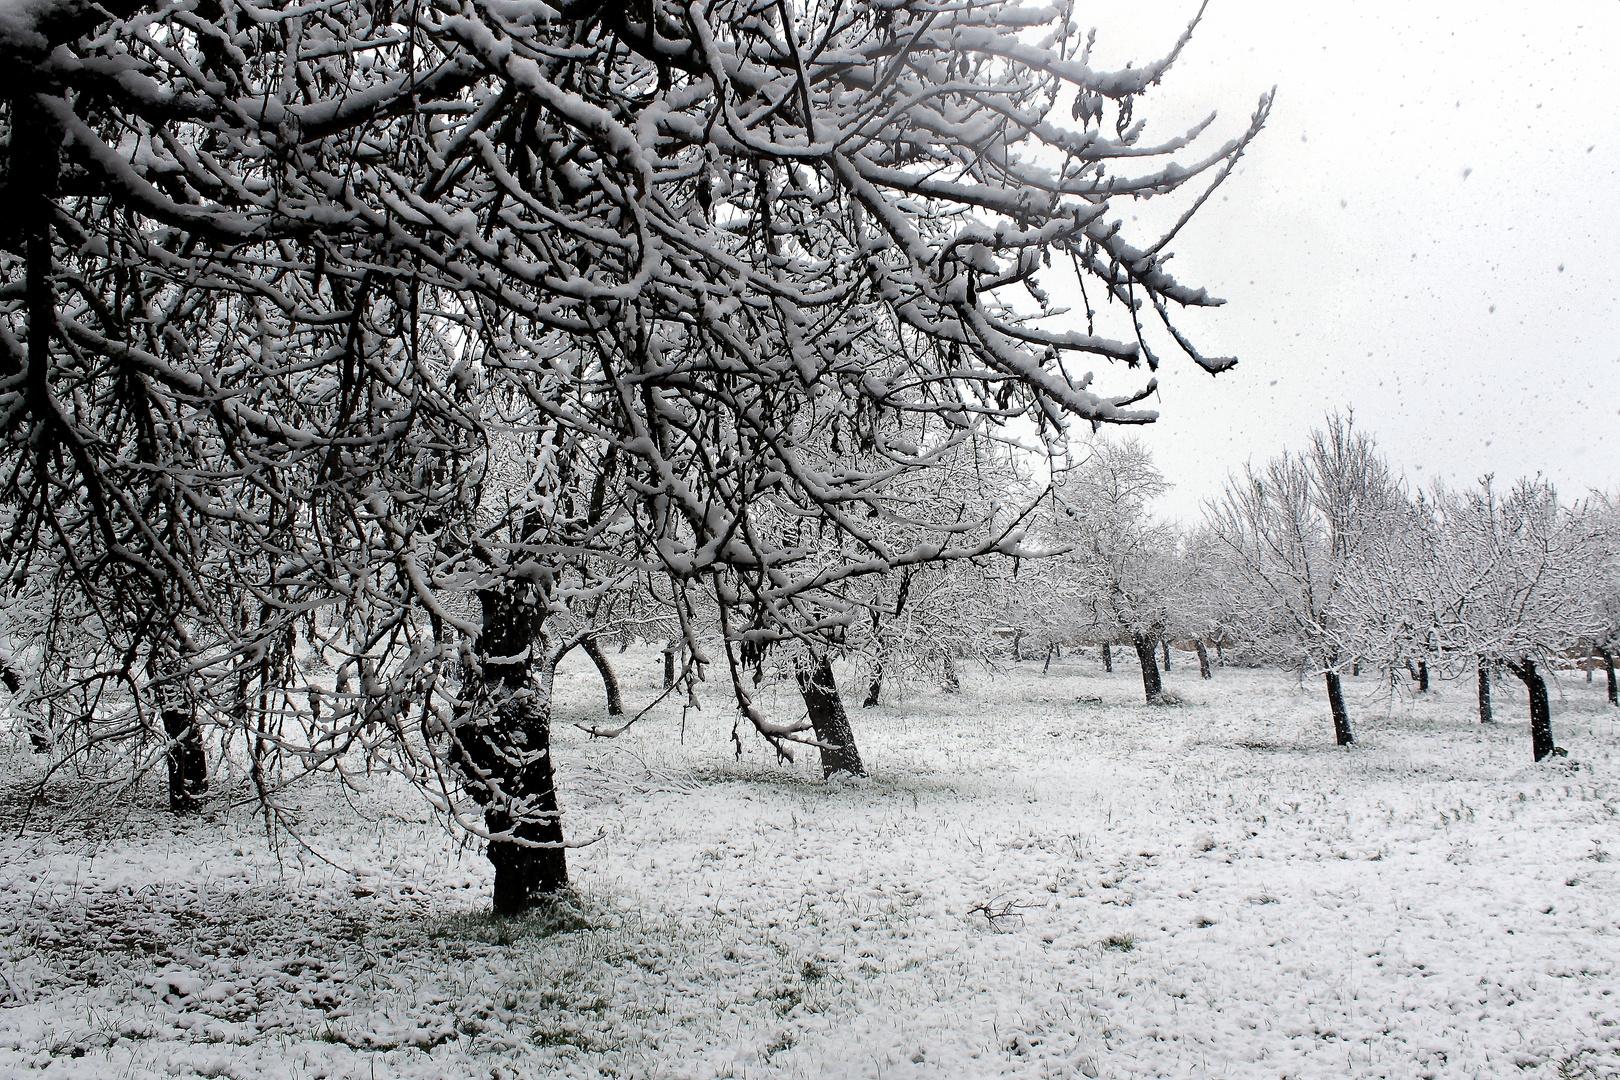 En plena nevada a nivel de mar en Mallorca ... poco habitual.